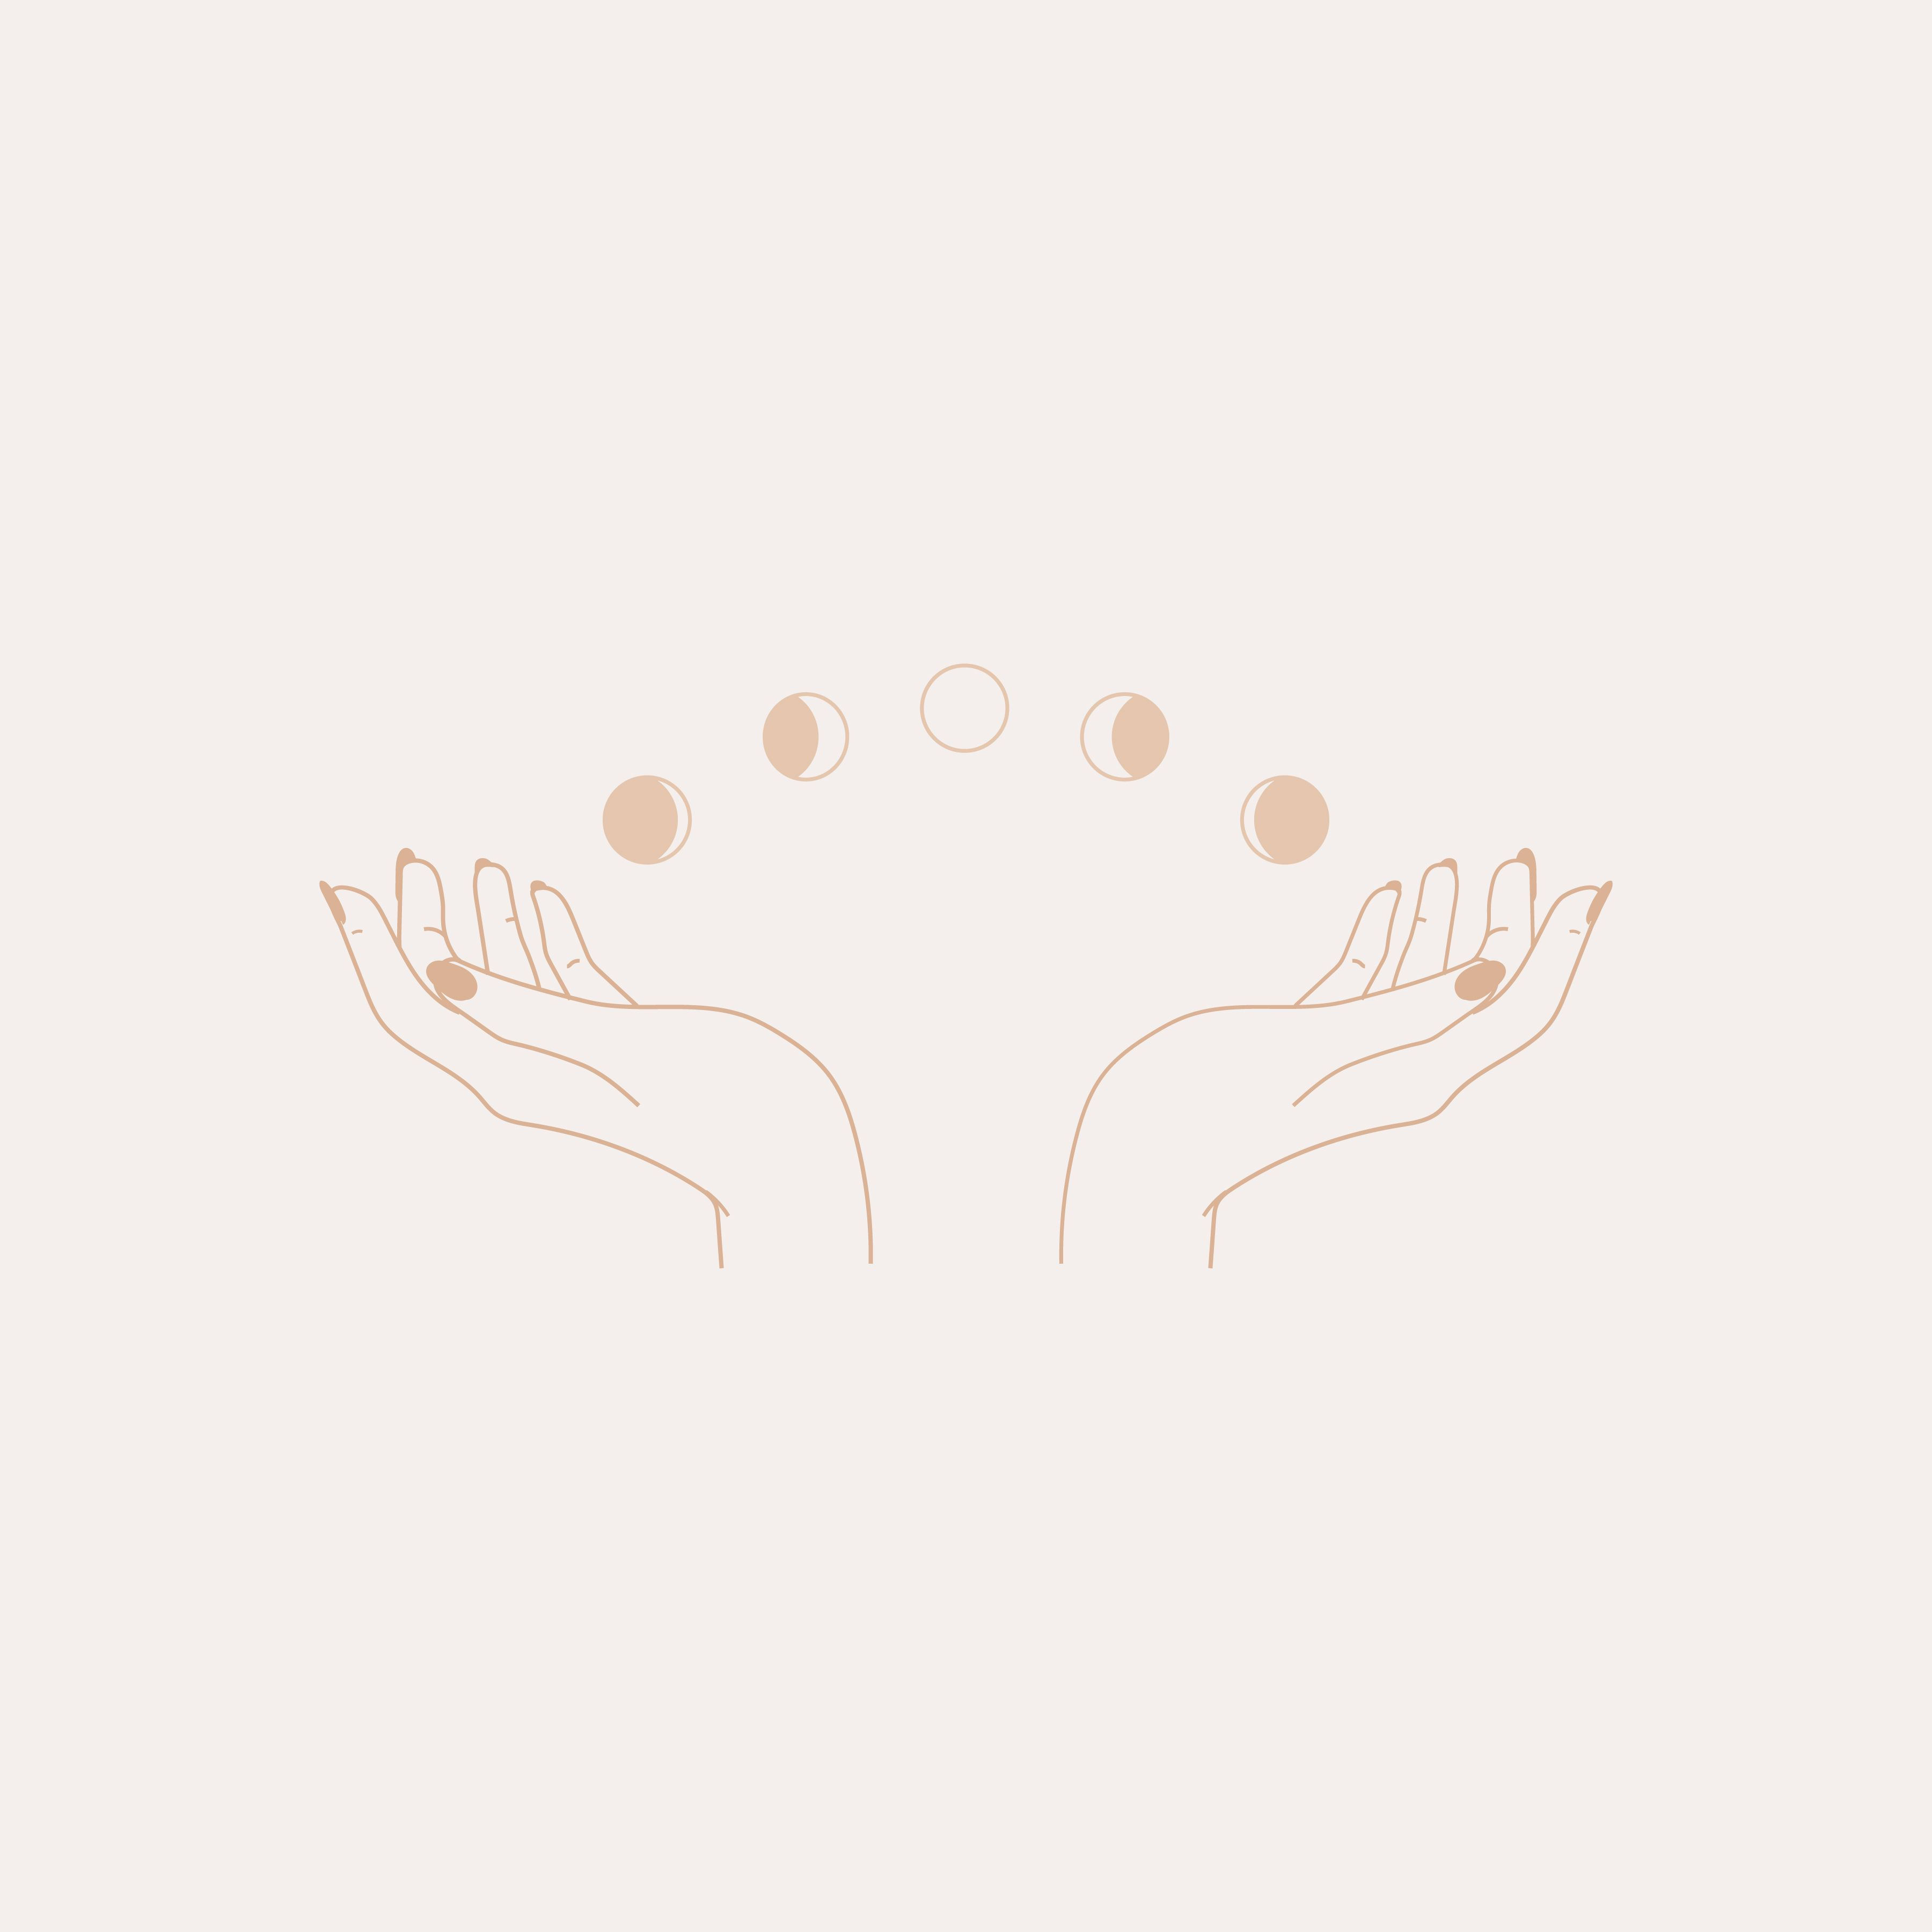 Moon Phase Hands Illustration Logo, Tumblr Art, Small